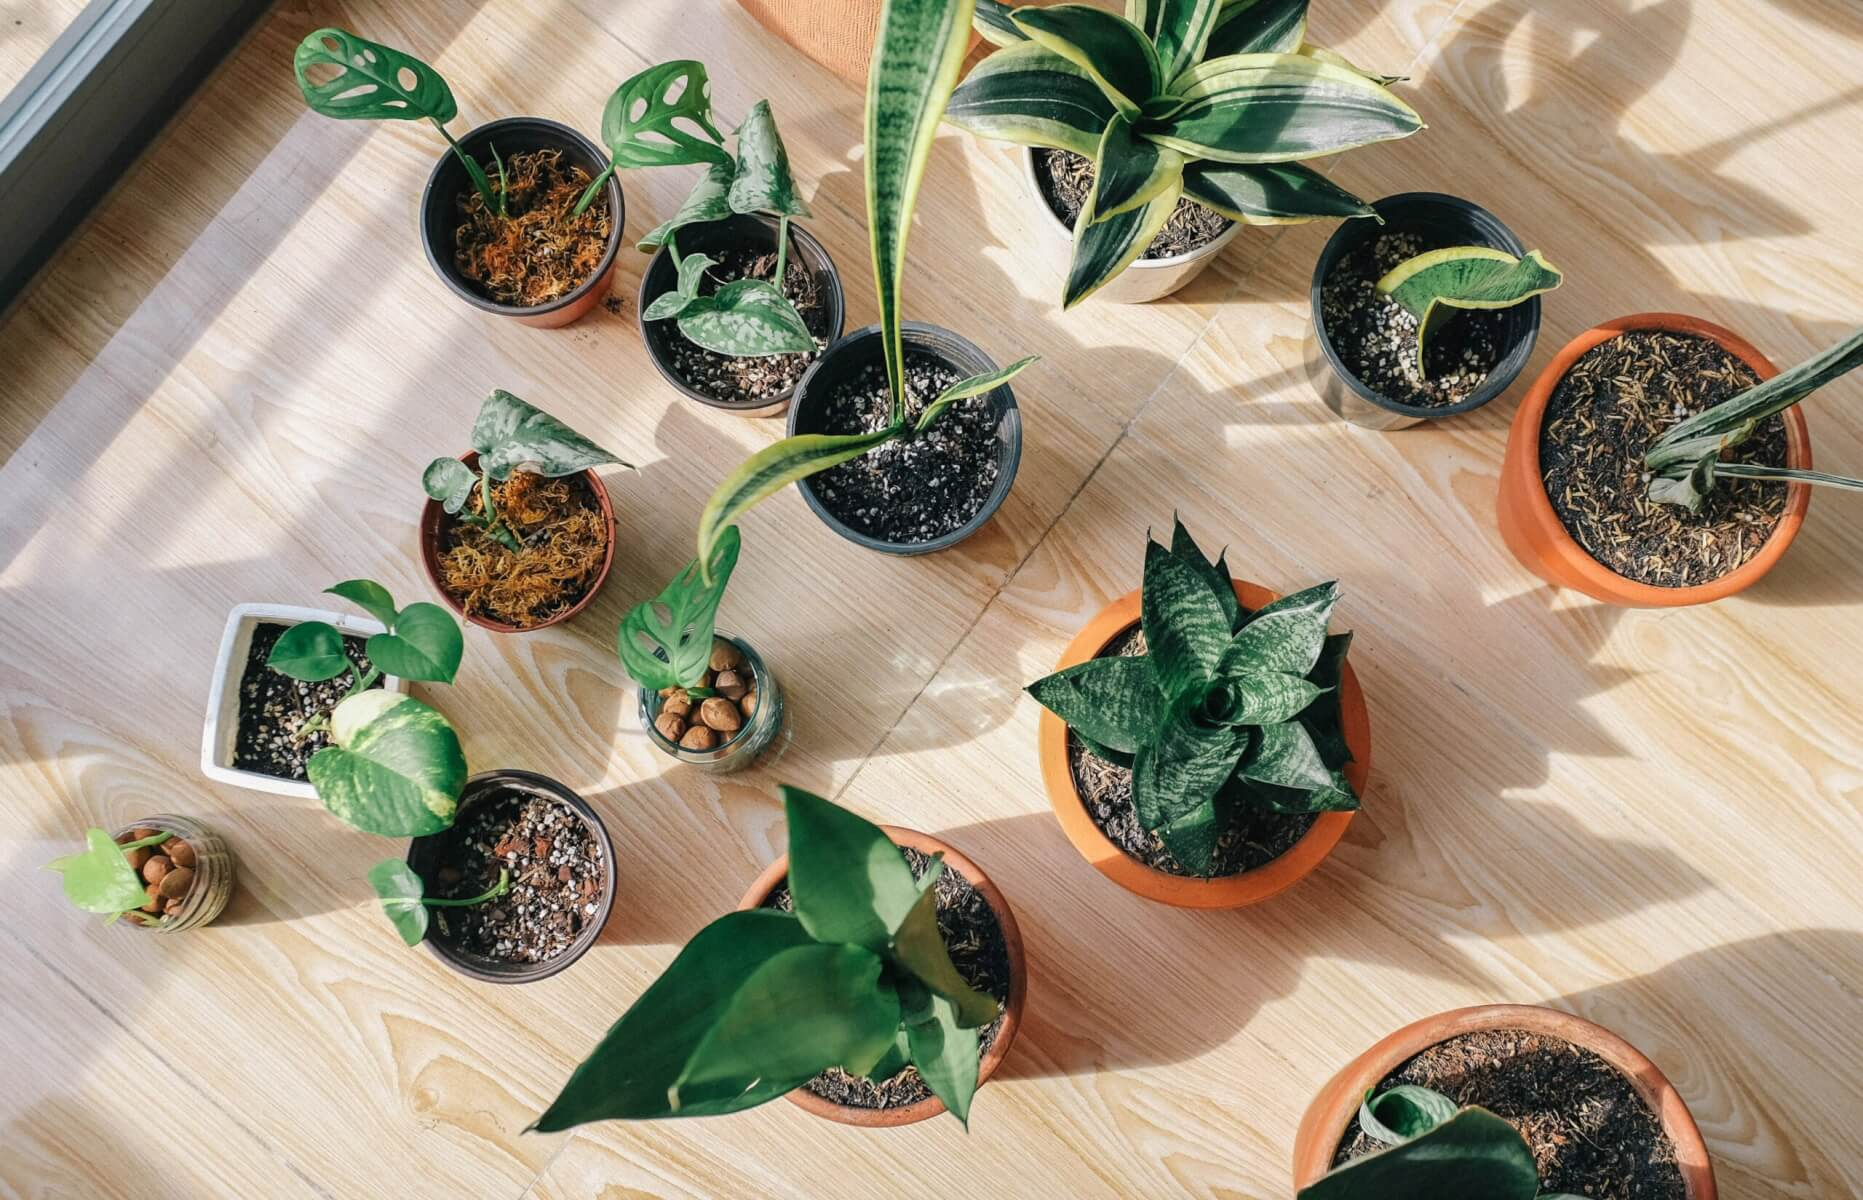 Fetilize Houseplants